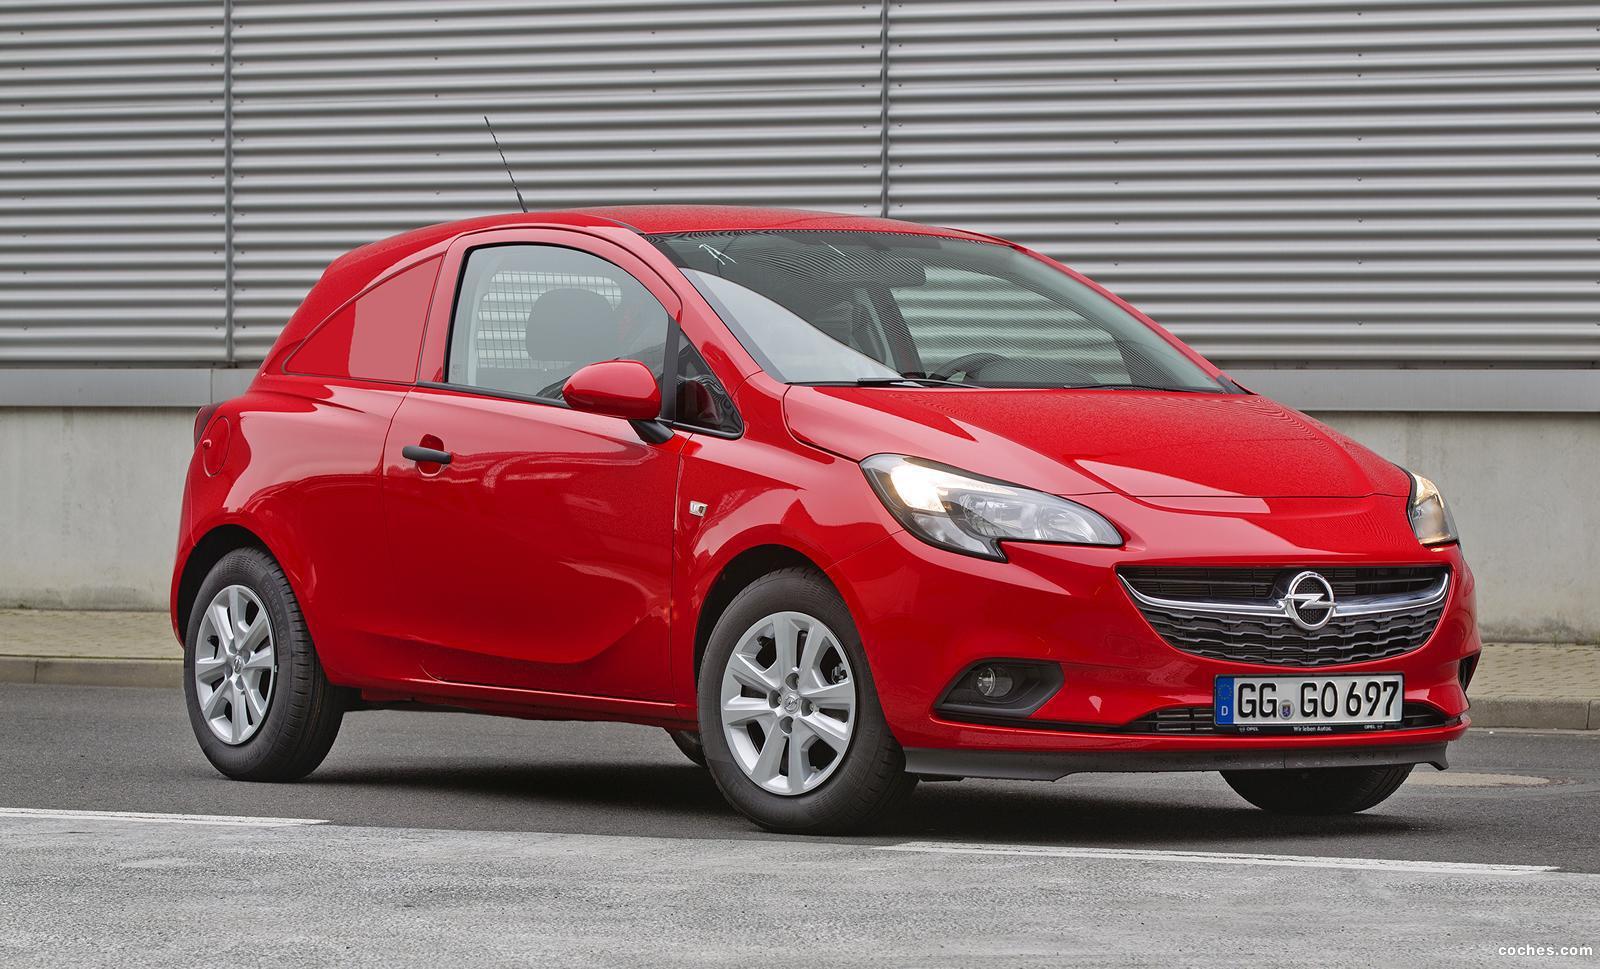 Foto 0 de Opel Corsa Van 2015